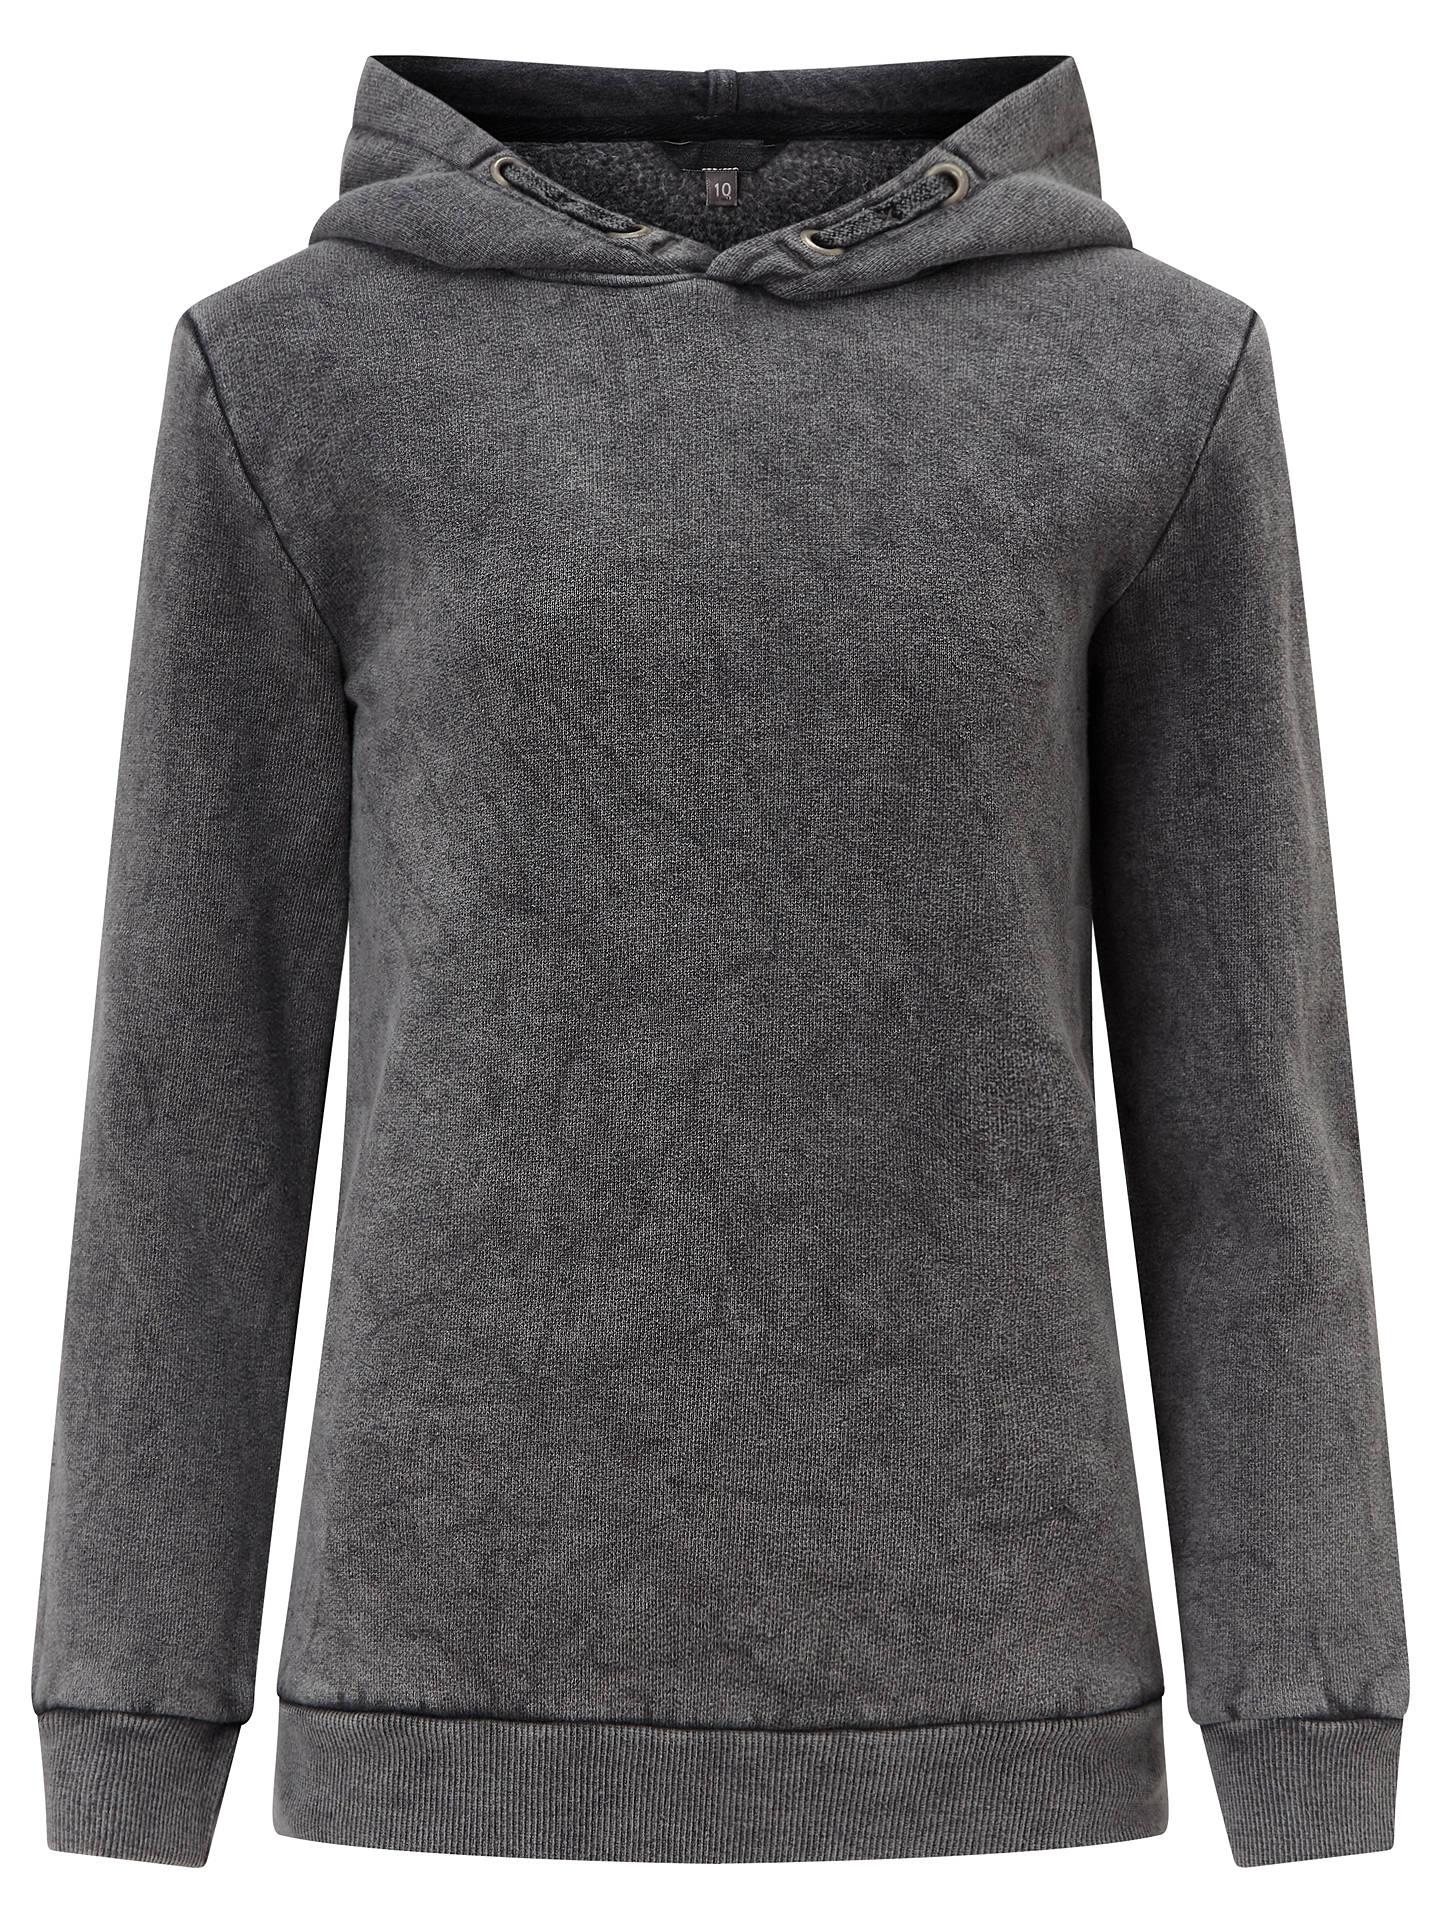 9e77ba2c3461 John Lewis Children s Hooded Sweatshirt